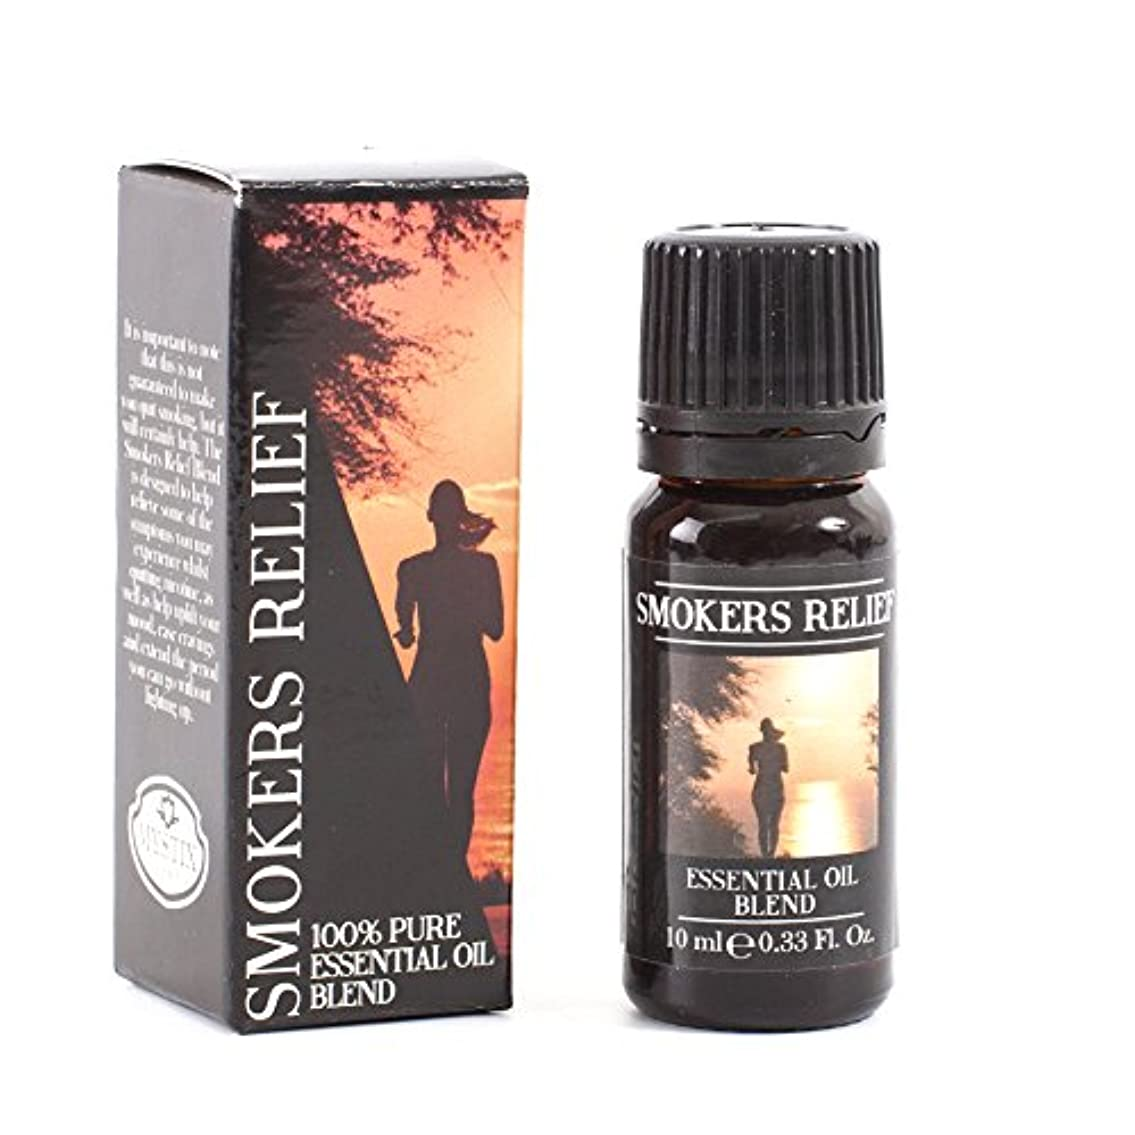 瞳活発化合物Mystix London | Smokers Relief Essential Oil Blend - 10ml - 100% Pure